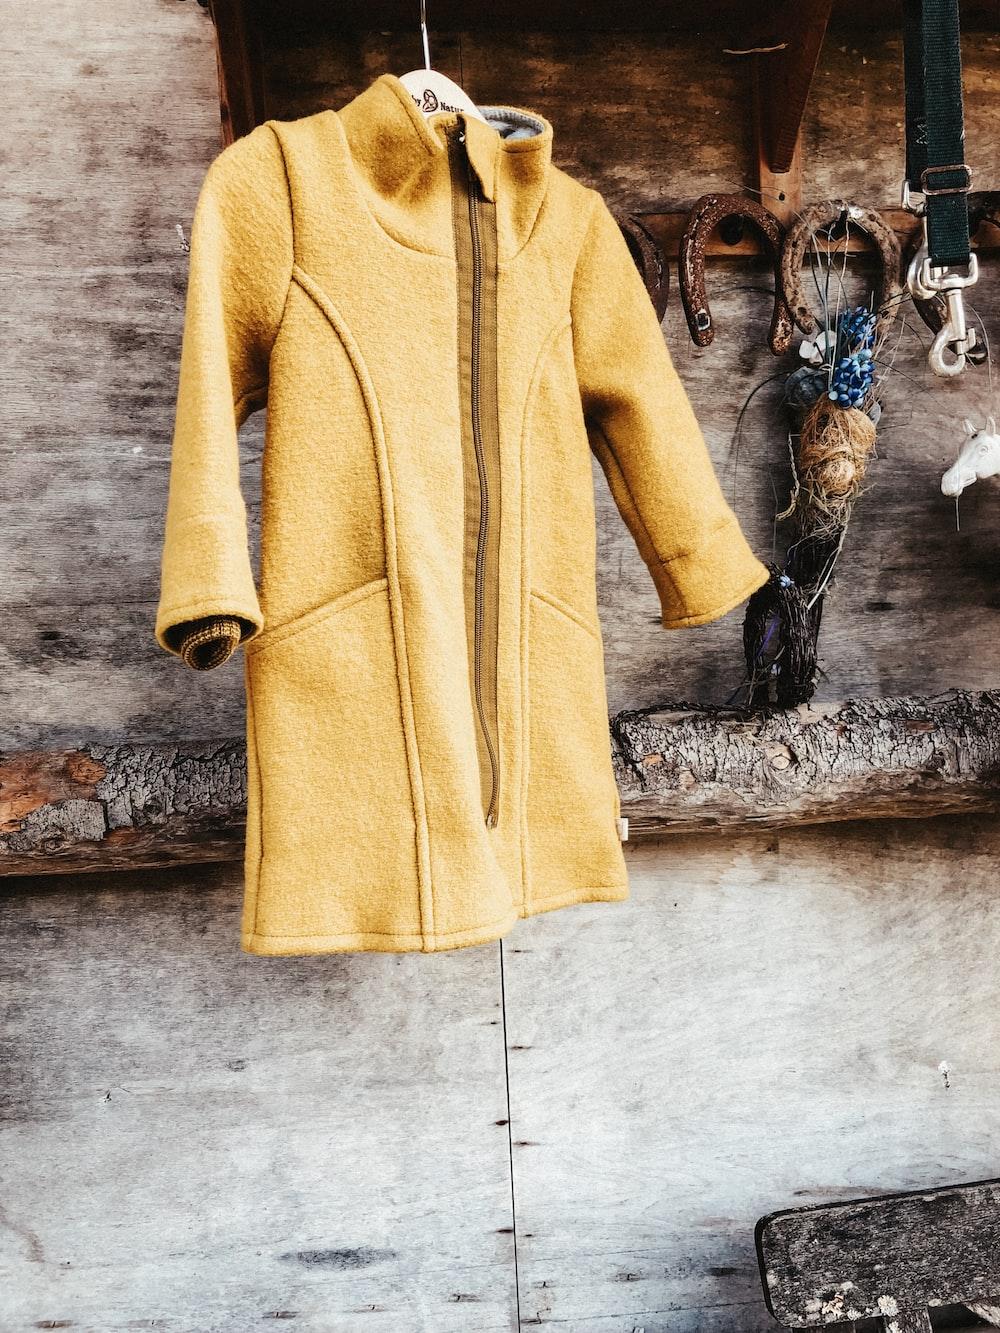 hanged yellow coat